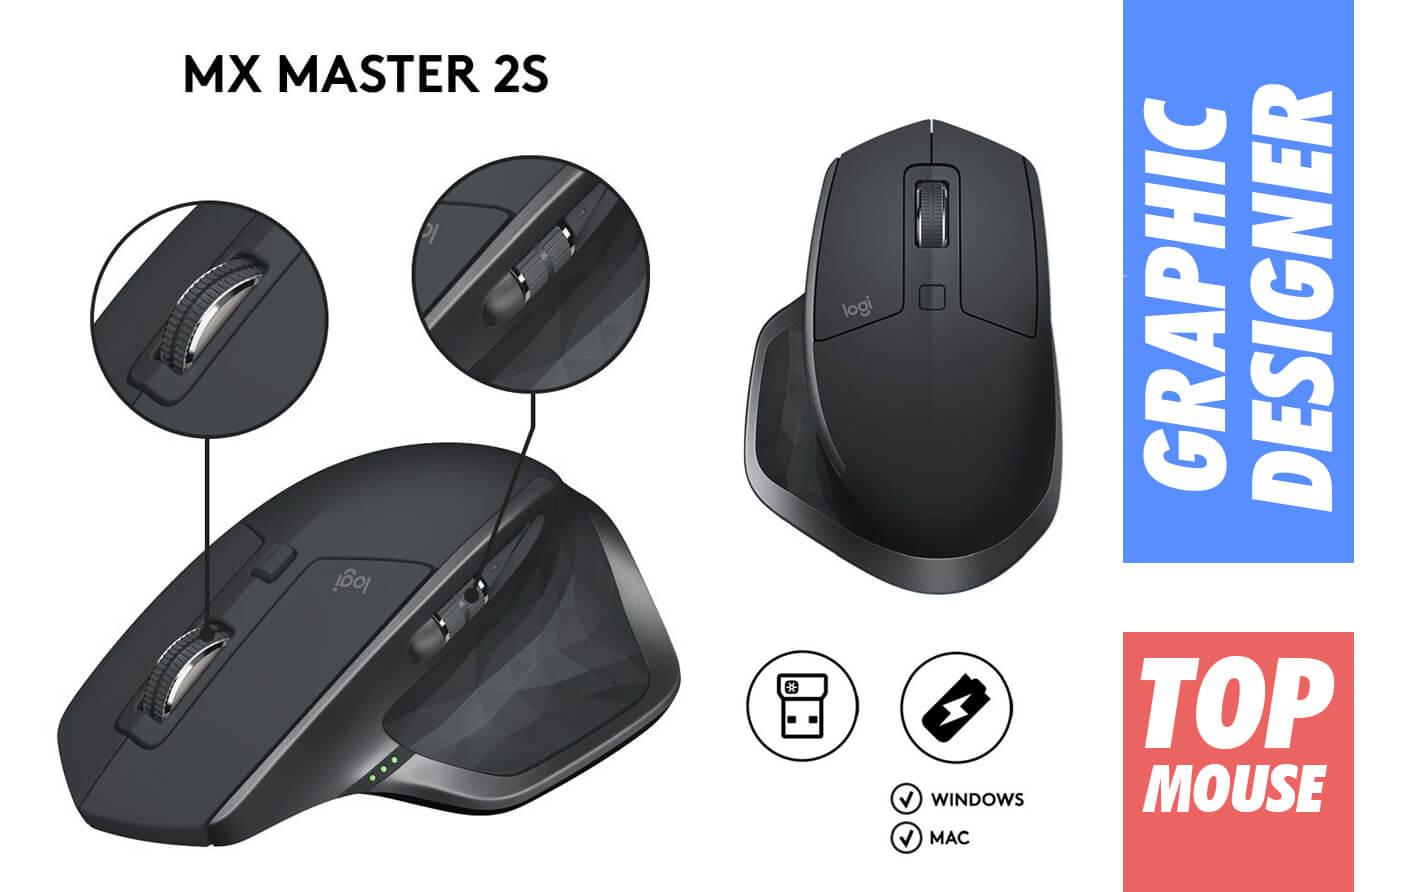 Miglior Mouse Per Graphic Designer